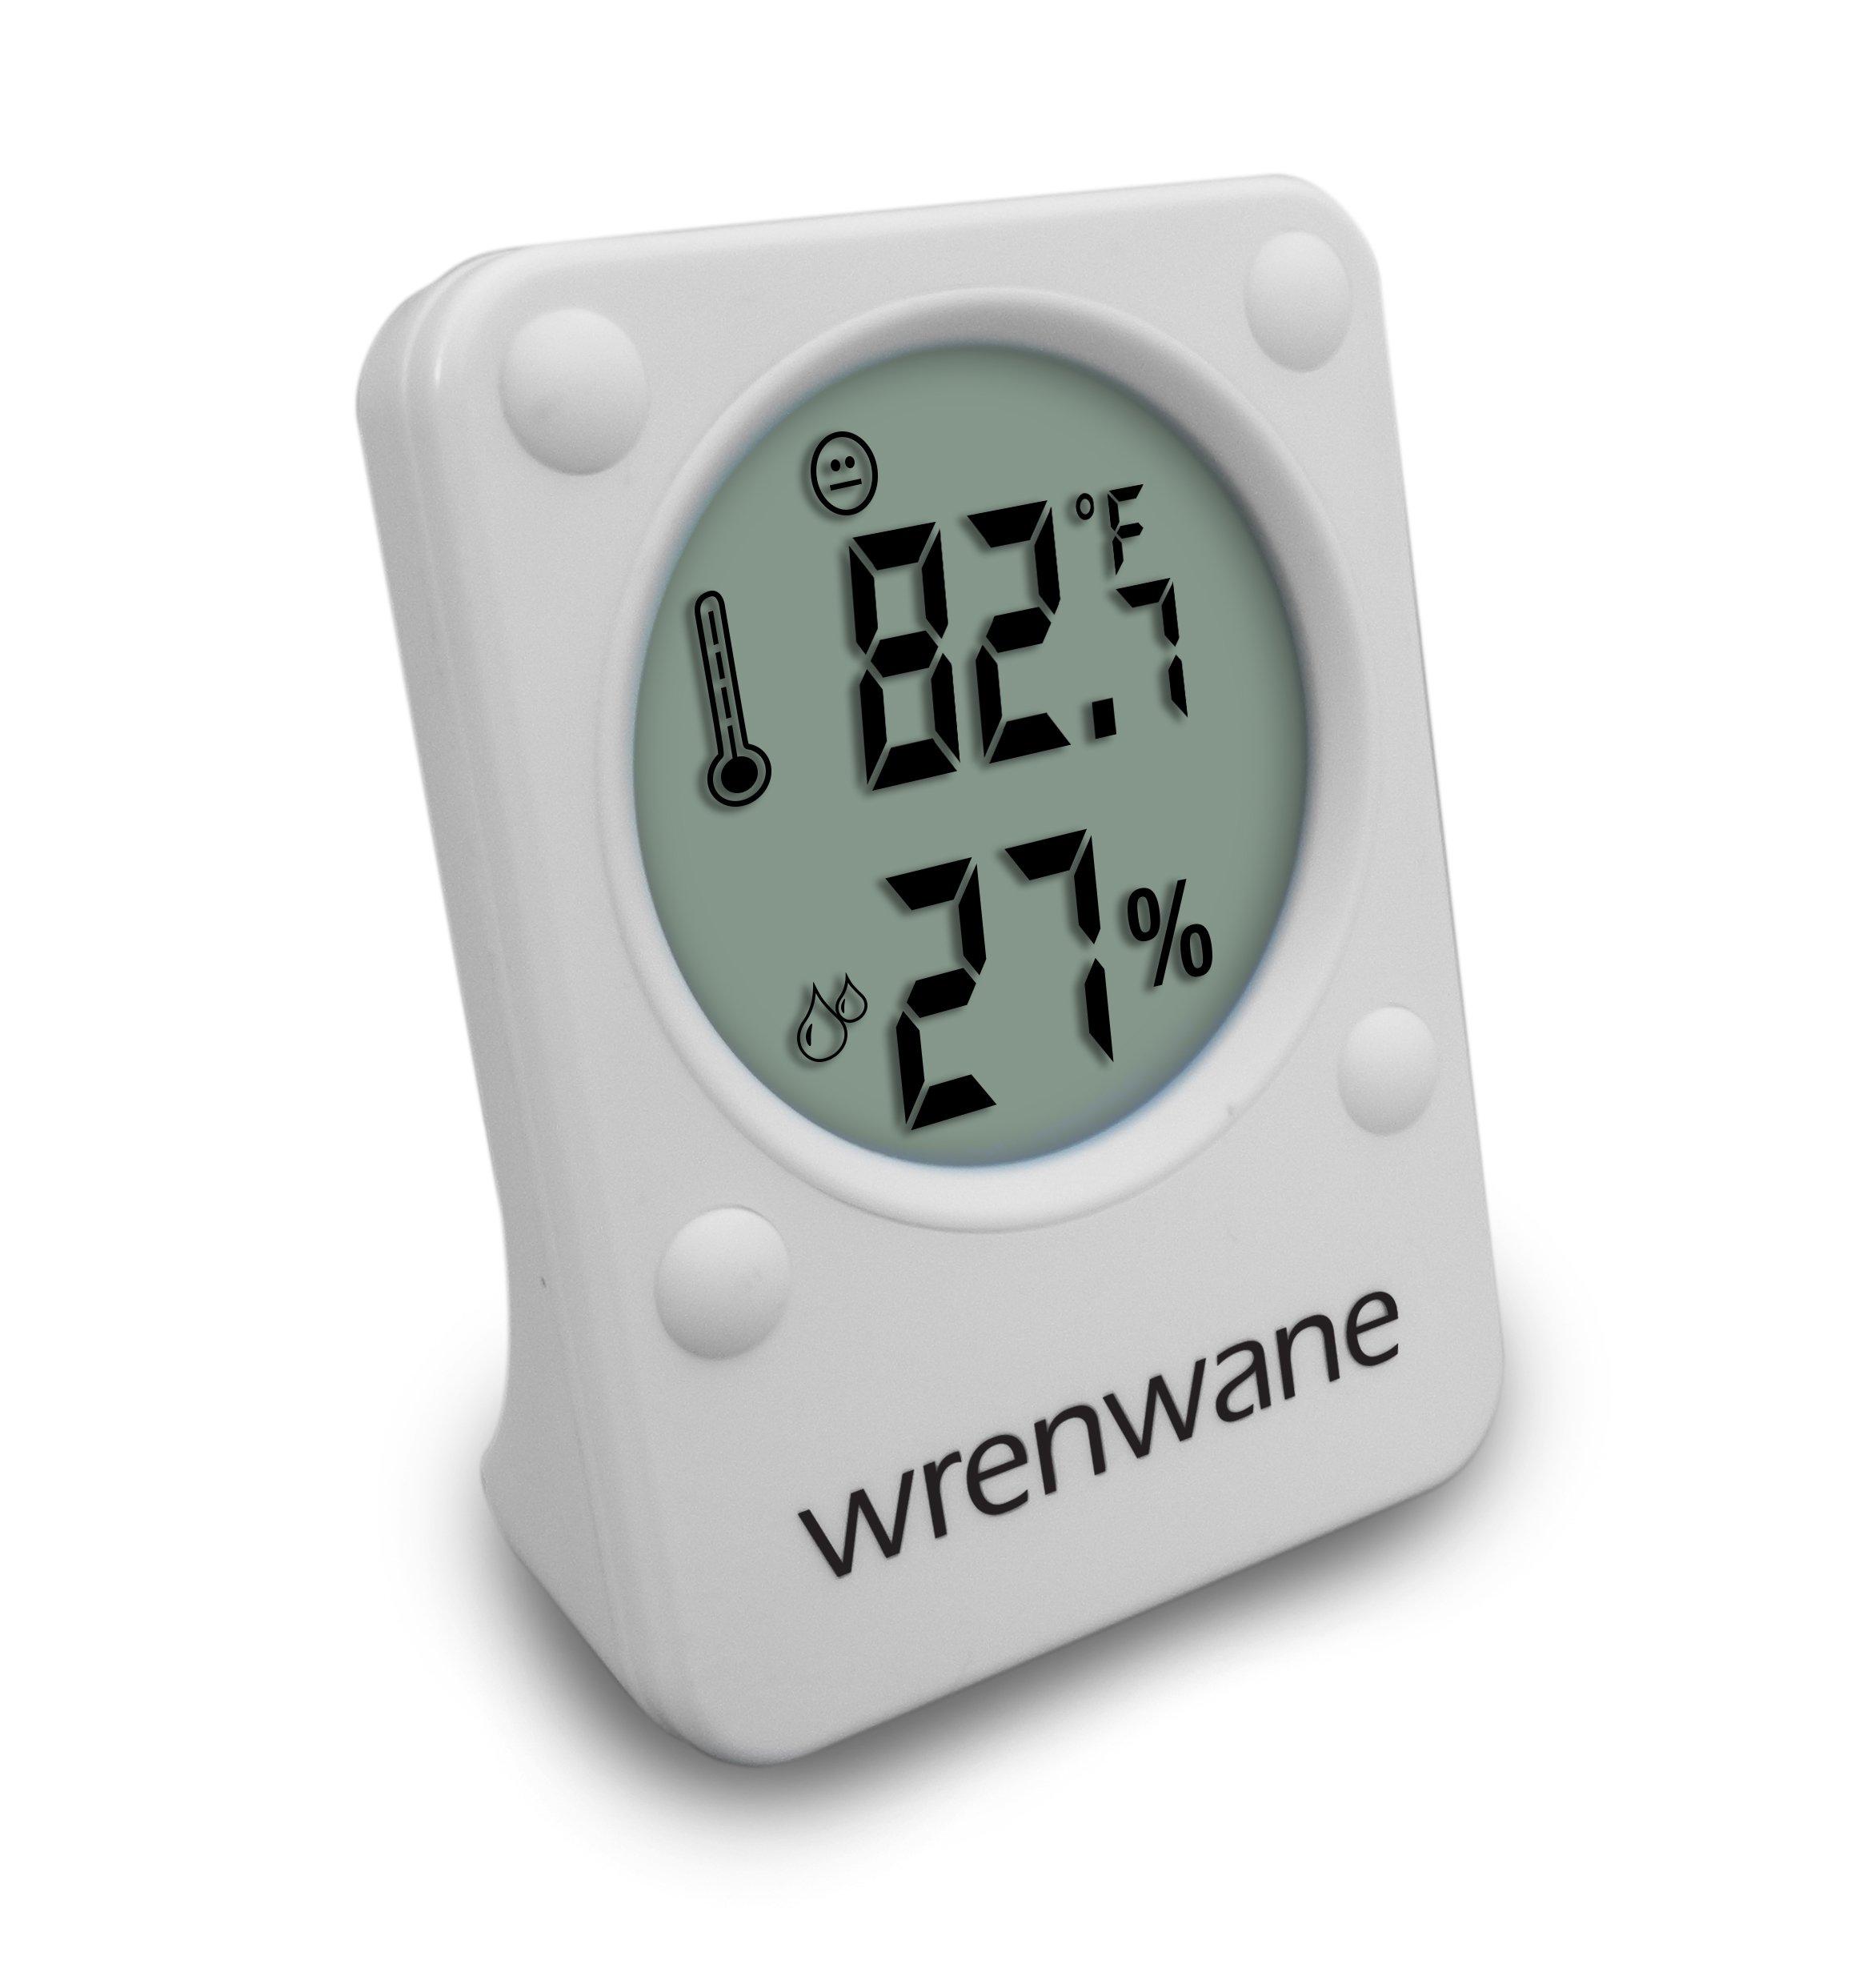 Wrenwane Hygrometer Humidity Sensor Indoor Room Thermometer Fahrenheit Or Celsius White